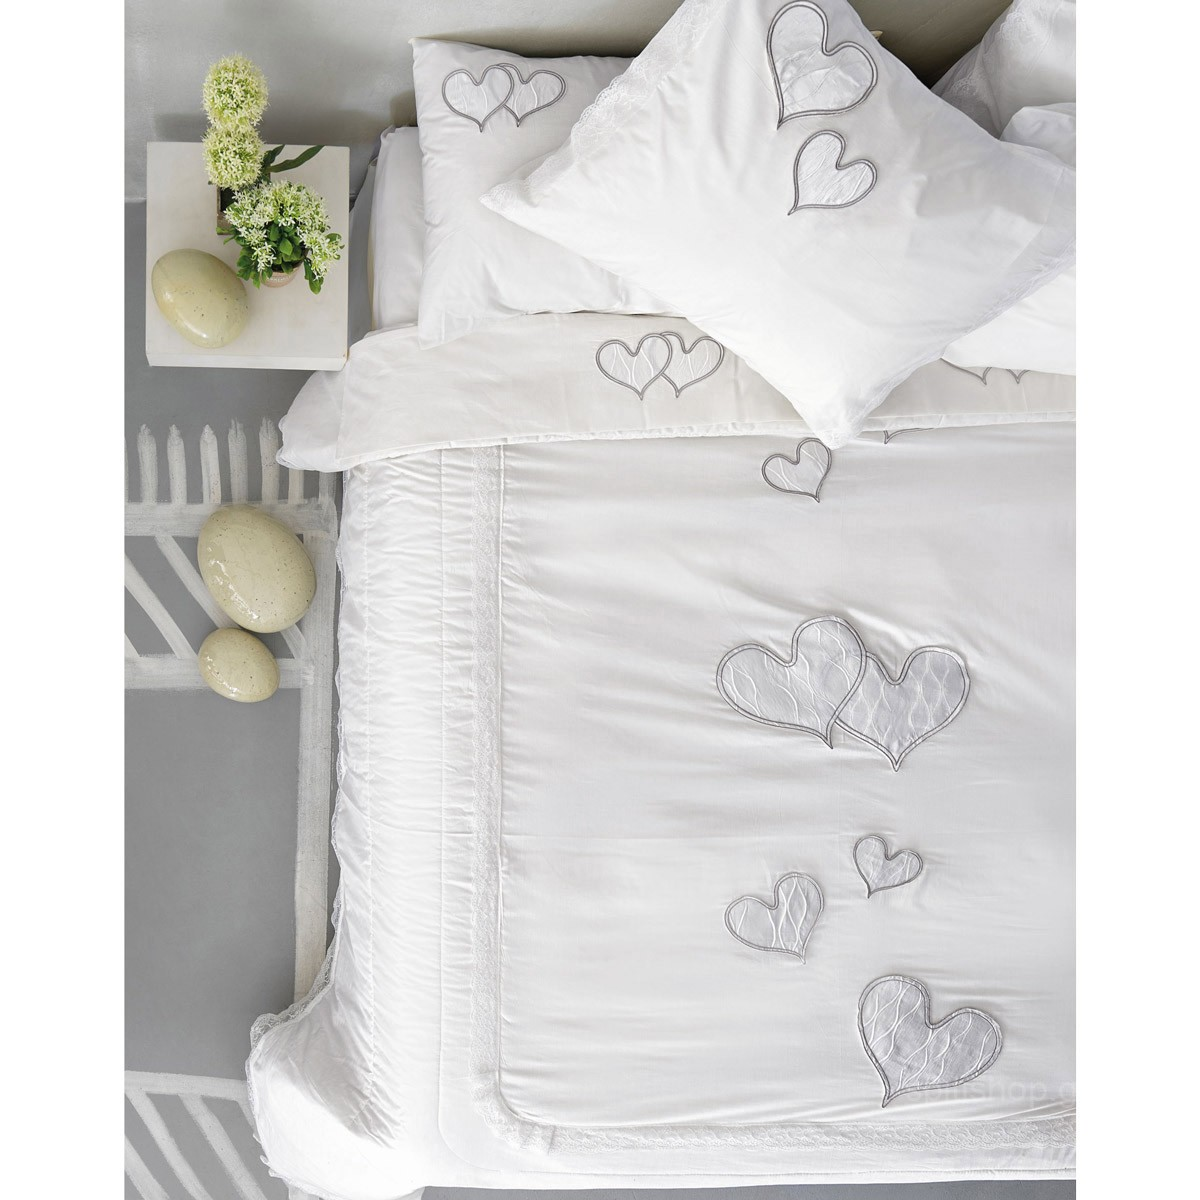 30c46f4caed Νυφικά Σεντόνια (Σετ) Palamaiki Wedding Romantic White 91356